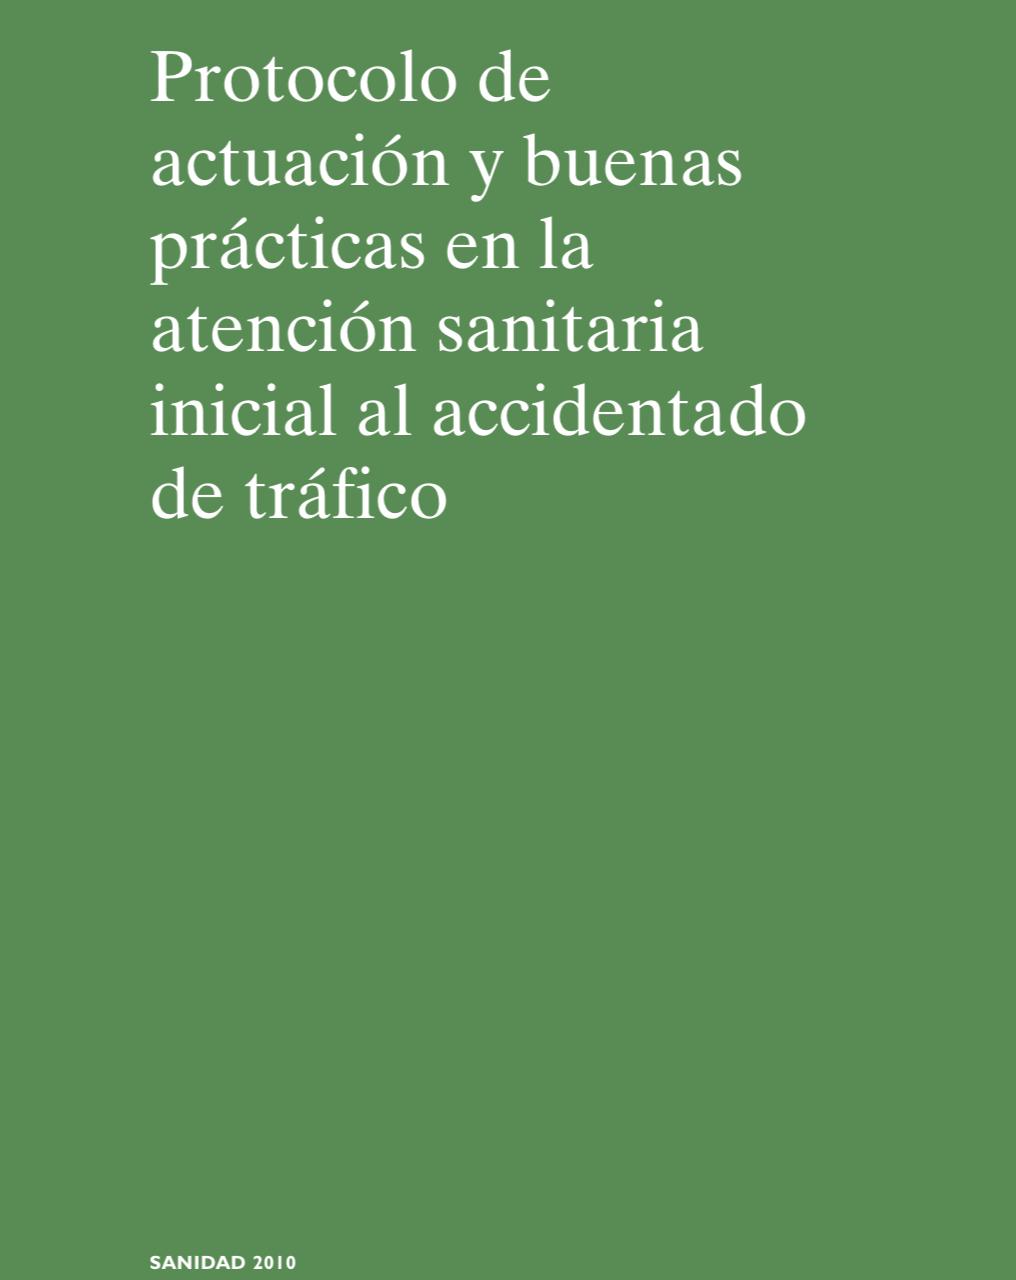 http://artemergencia.es/wp-content/uploads/2018/05/portada-protocolo-semes-1016x1280.png